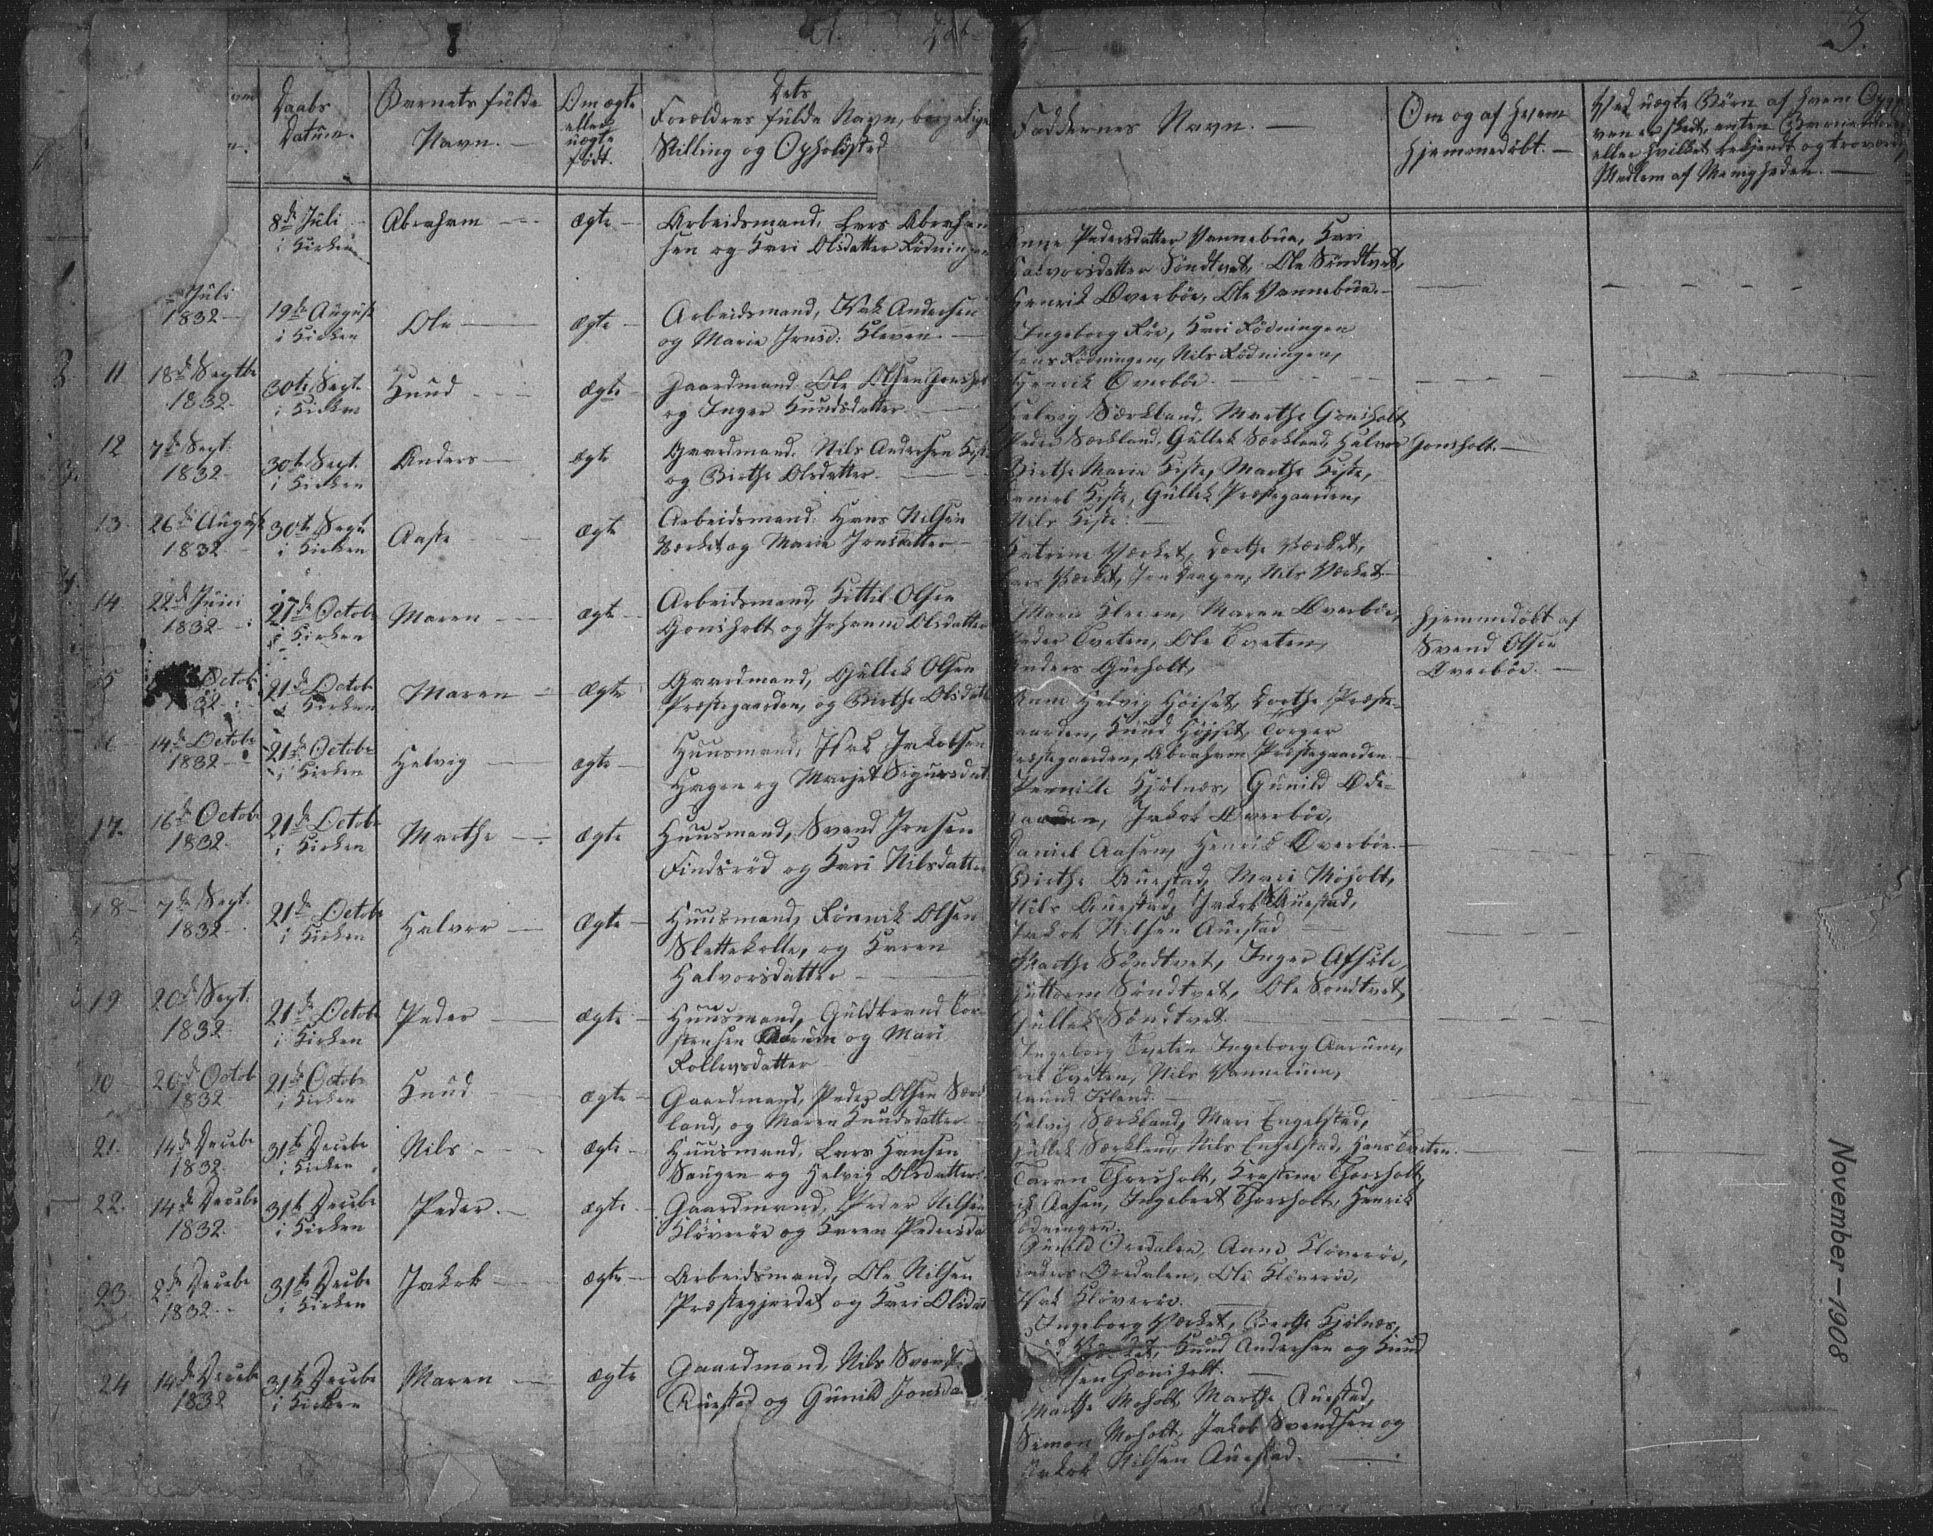 SAKO, Siljan kirkebøker, F/Fa/L0001: Parish register (official) no. 1, 1831-1870, p. 3